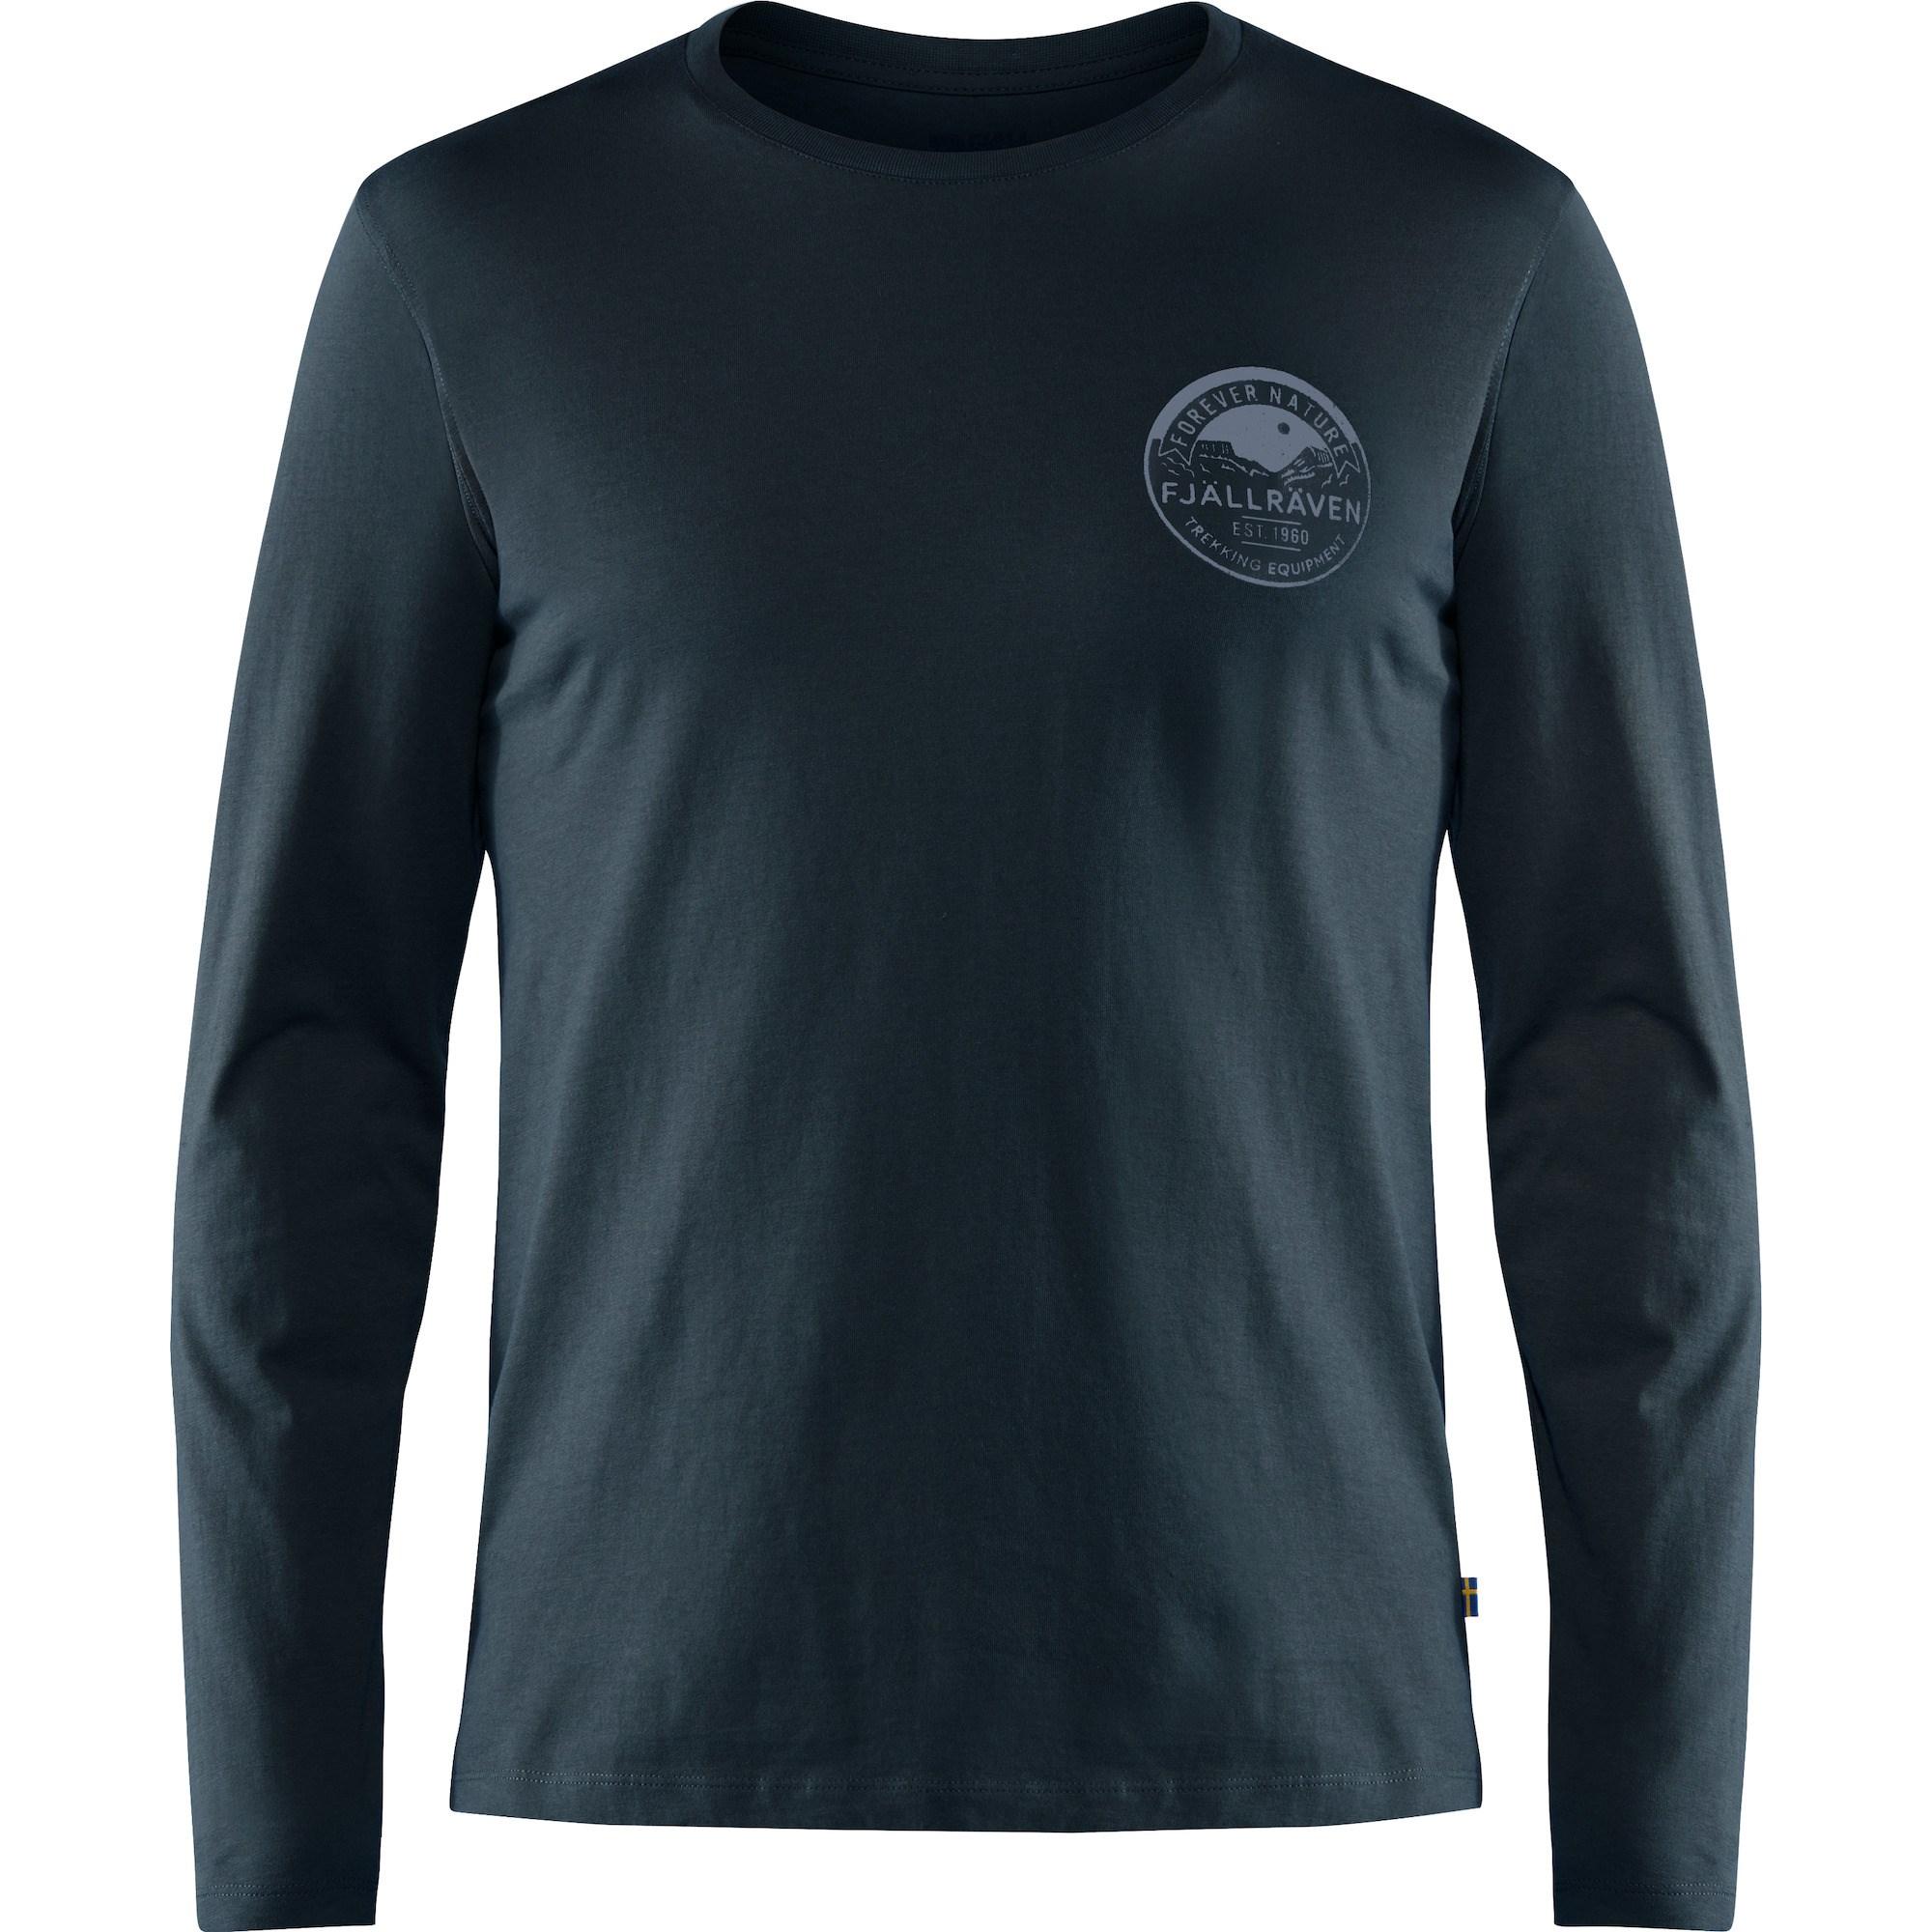 WINTER SALE! Fjallraven Nature Badge T-Shirt Green